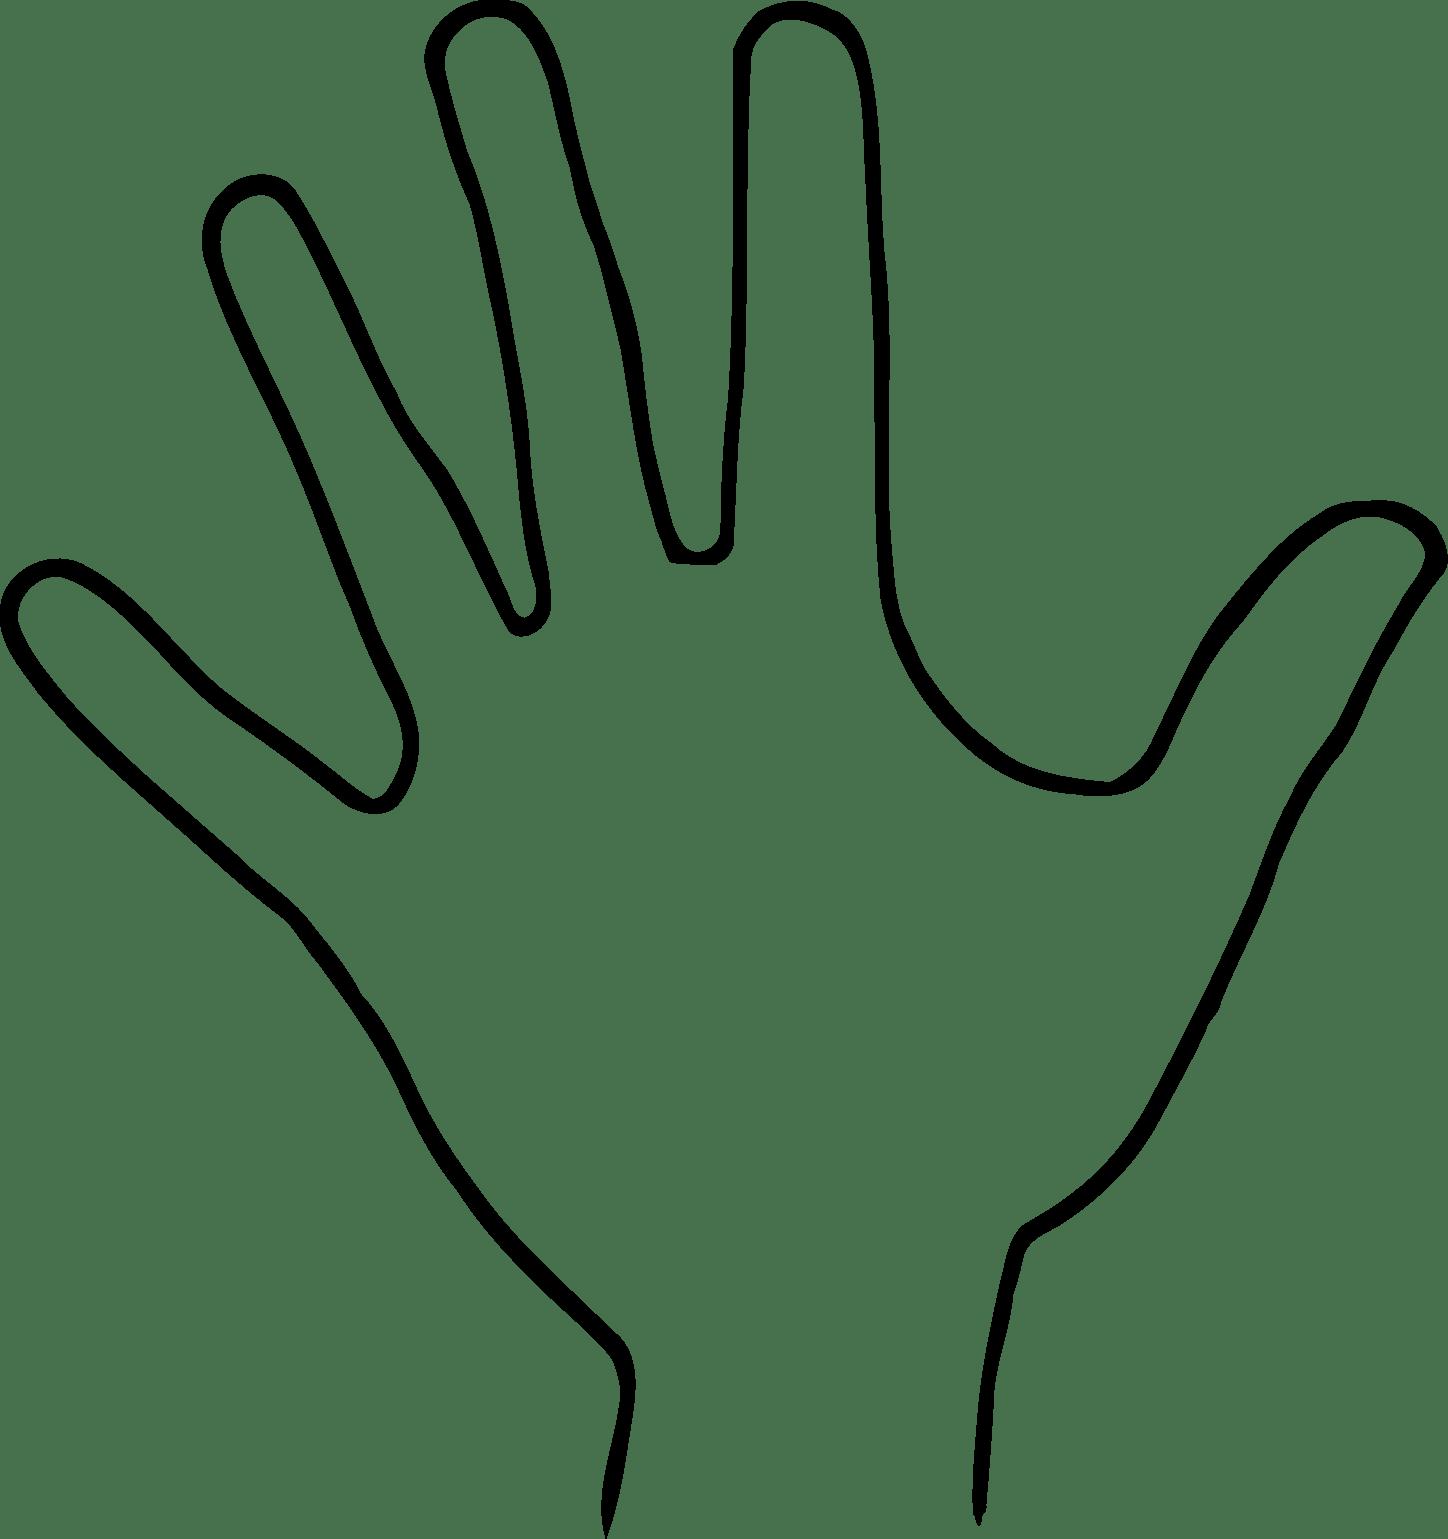 Hand Outline Gclipart